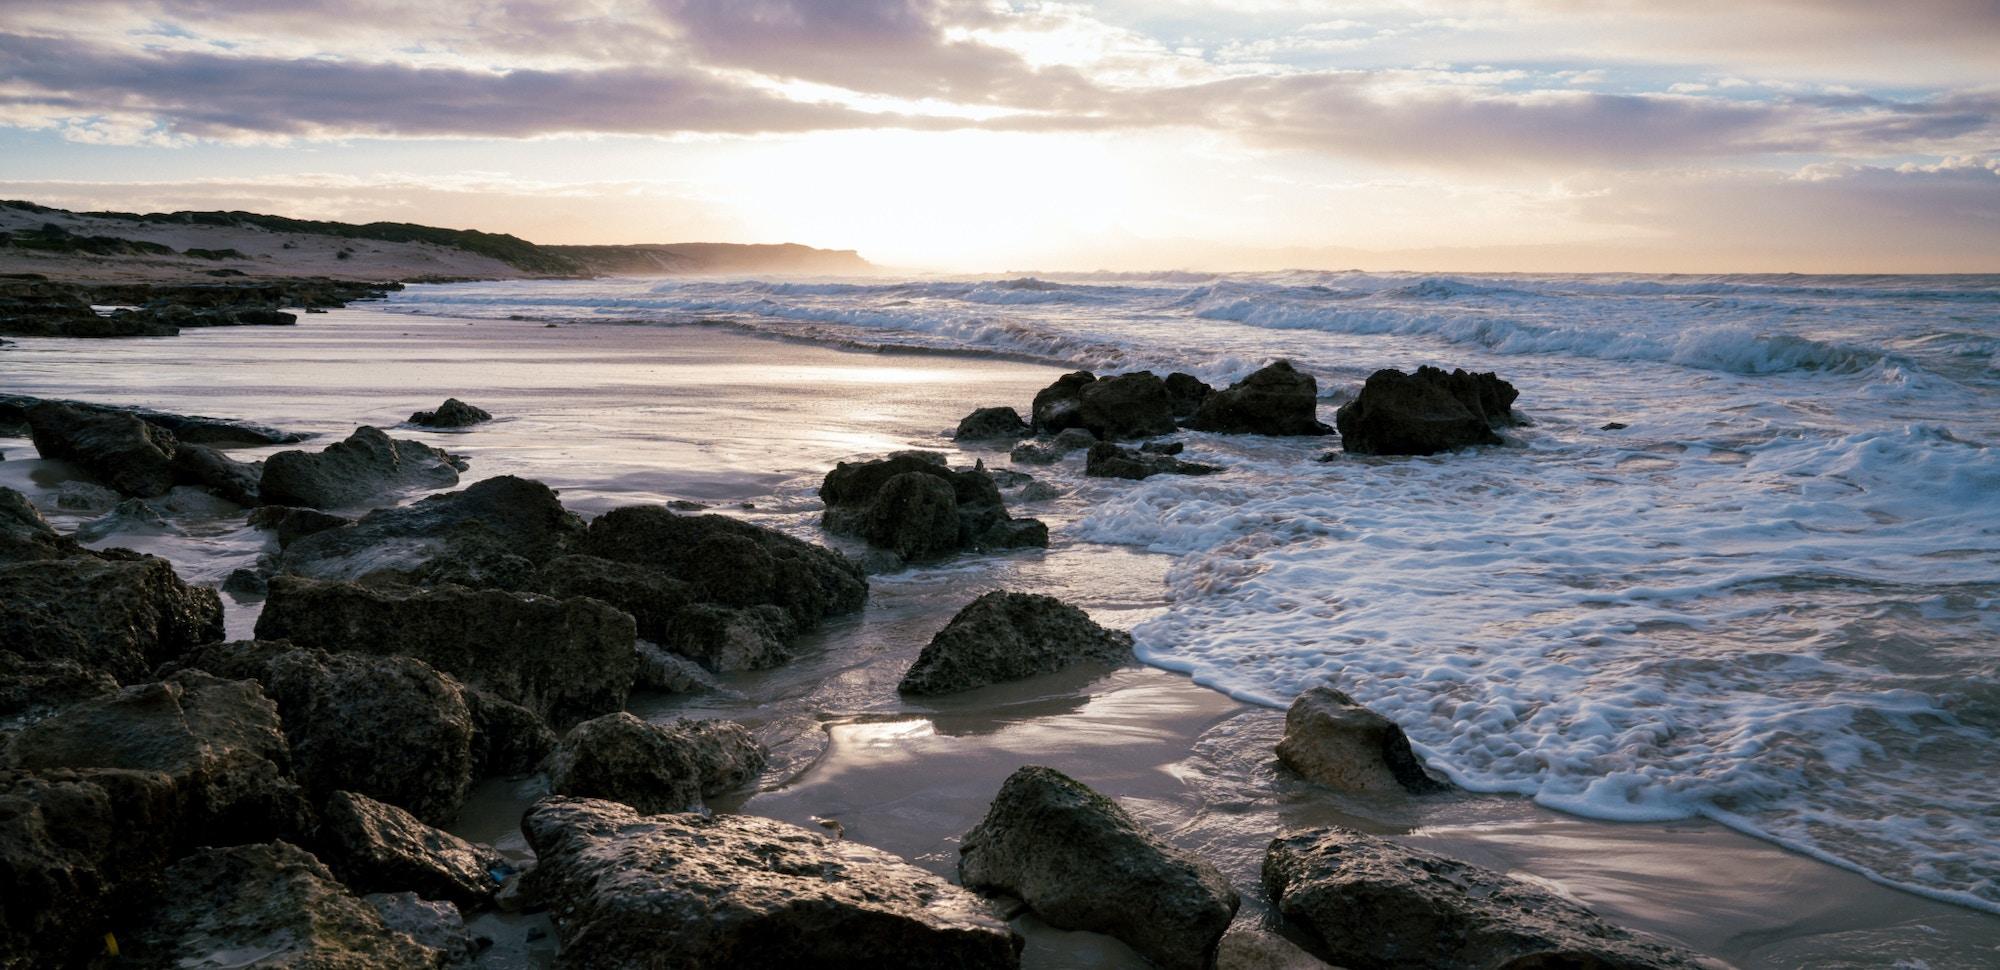 Mitchells Plain Ocean Scenery 2